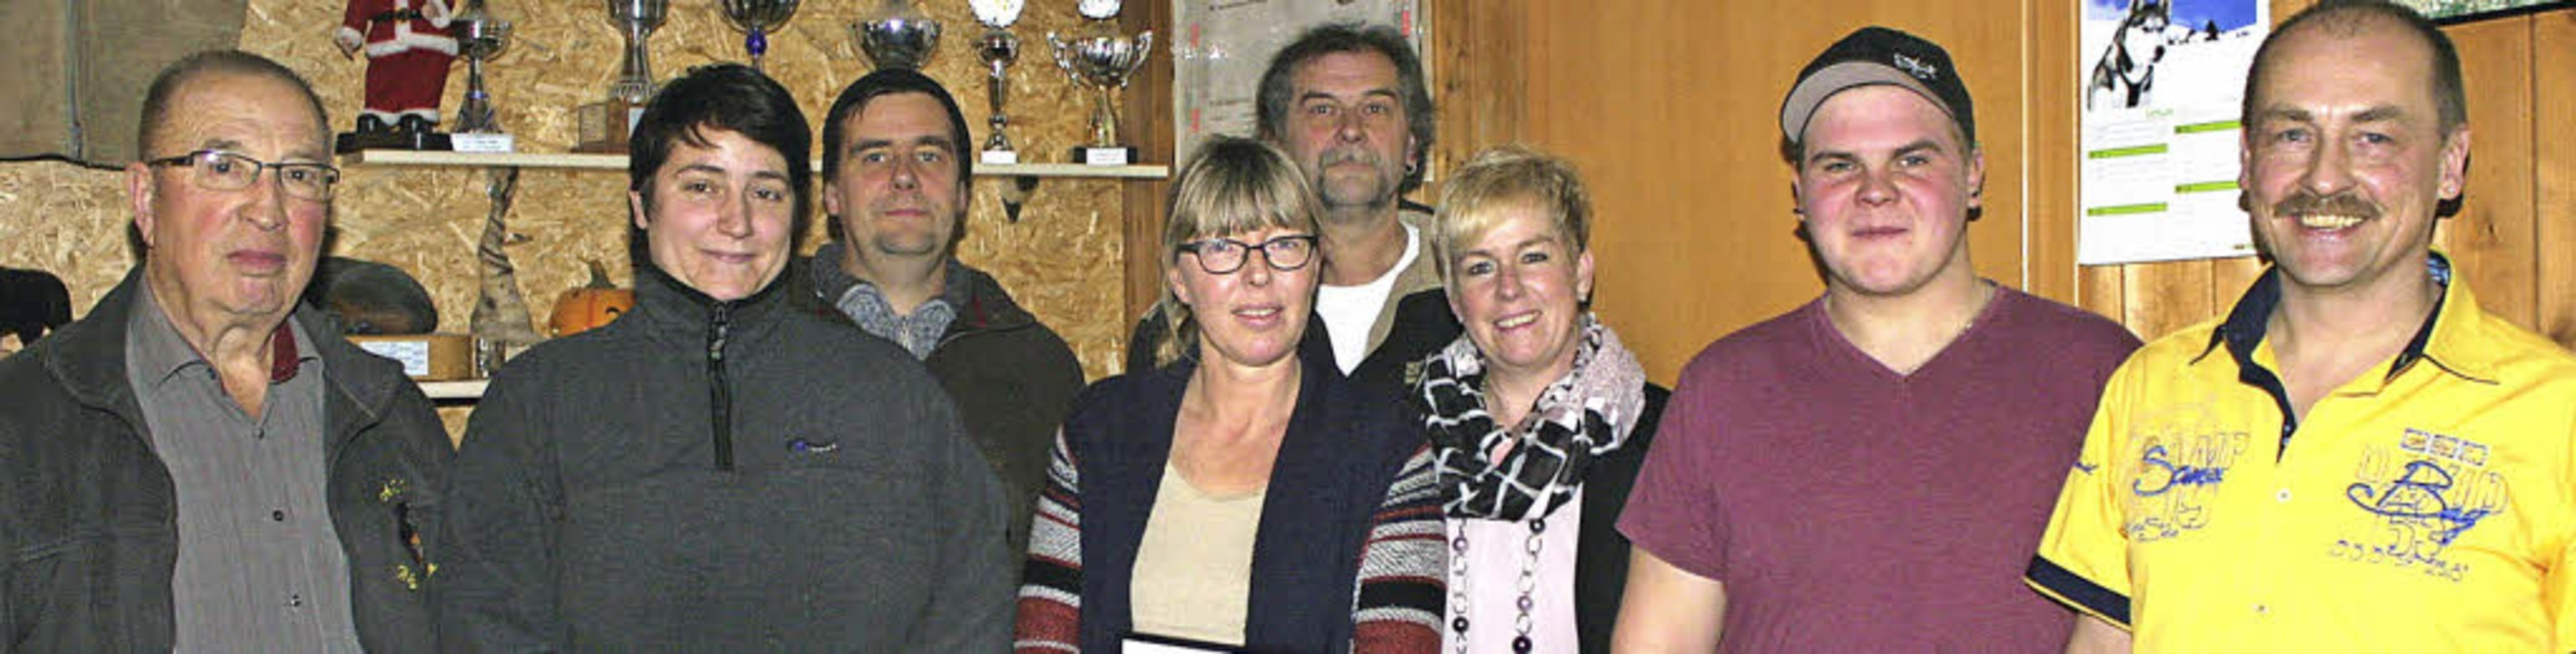 Claudia Kern (mit Brille) schied aus d...ula Gempp, Bernd Rebbe und Peter Gempp  | Foto: cremer